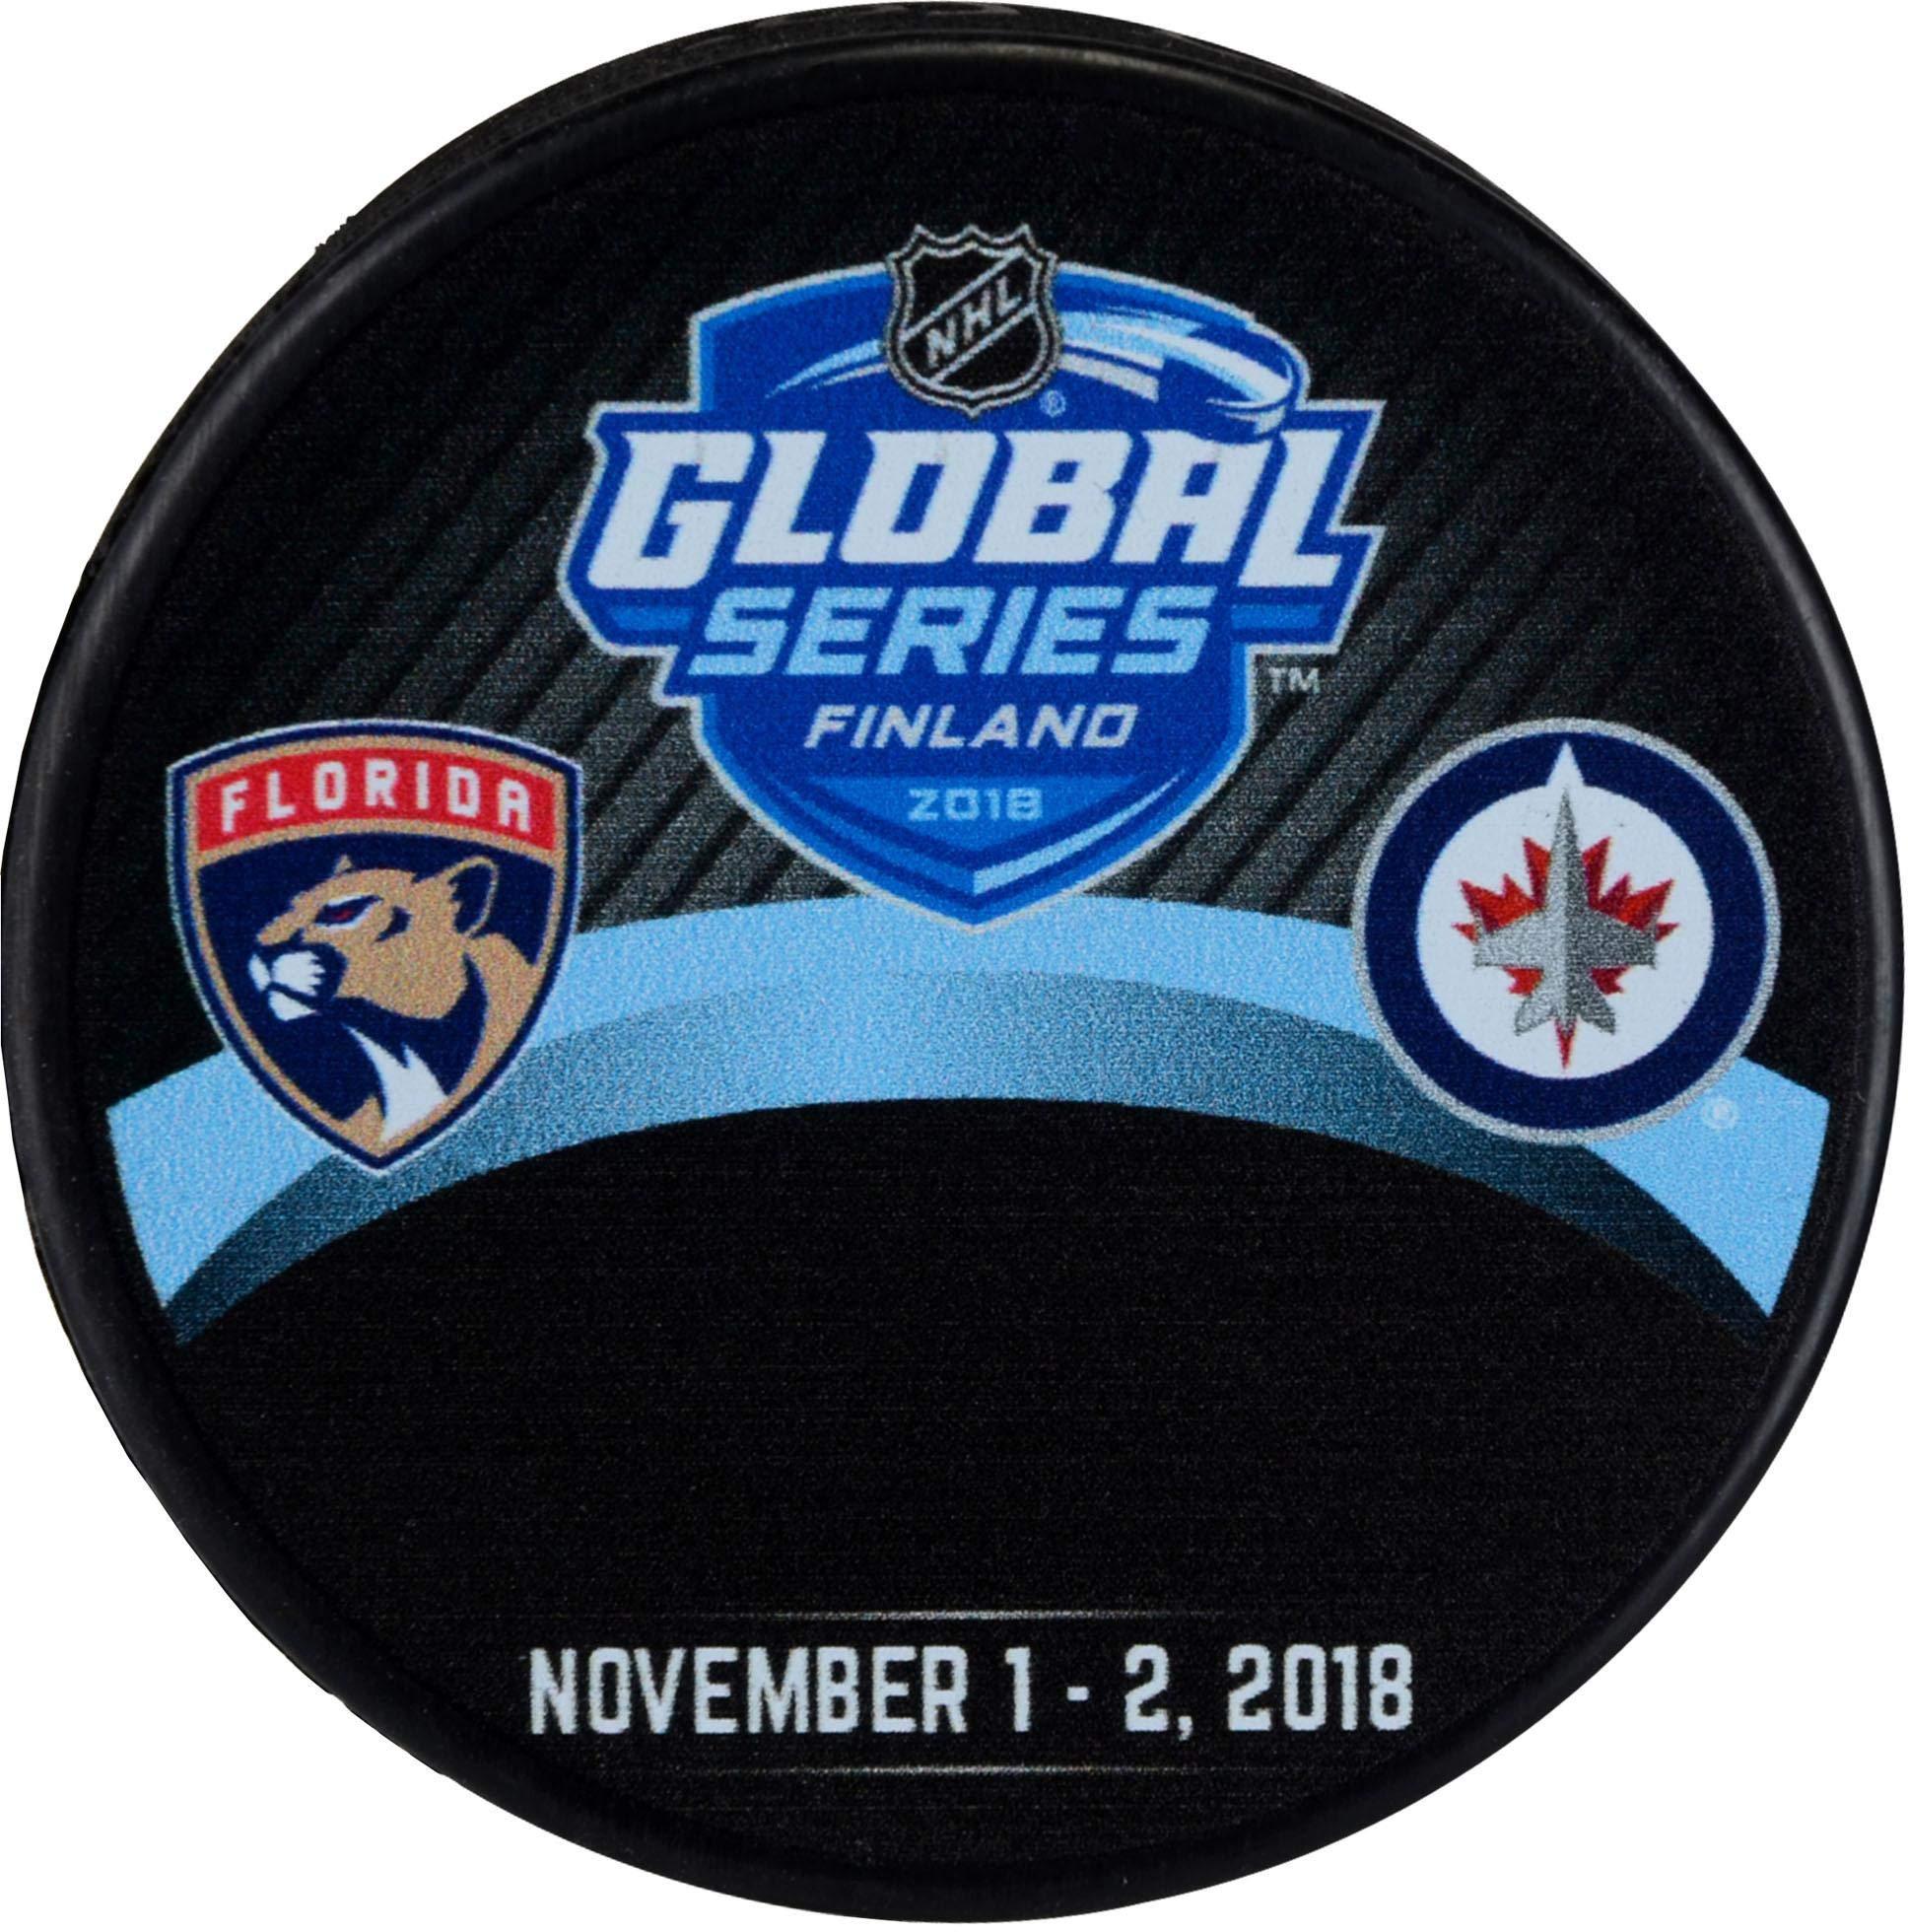 2018 Global Series Florida Panthers vs. Winnipeg Jets Unsigned Commemorative Autograph Model Hockey Puck Fanatics Authentic Certified